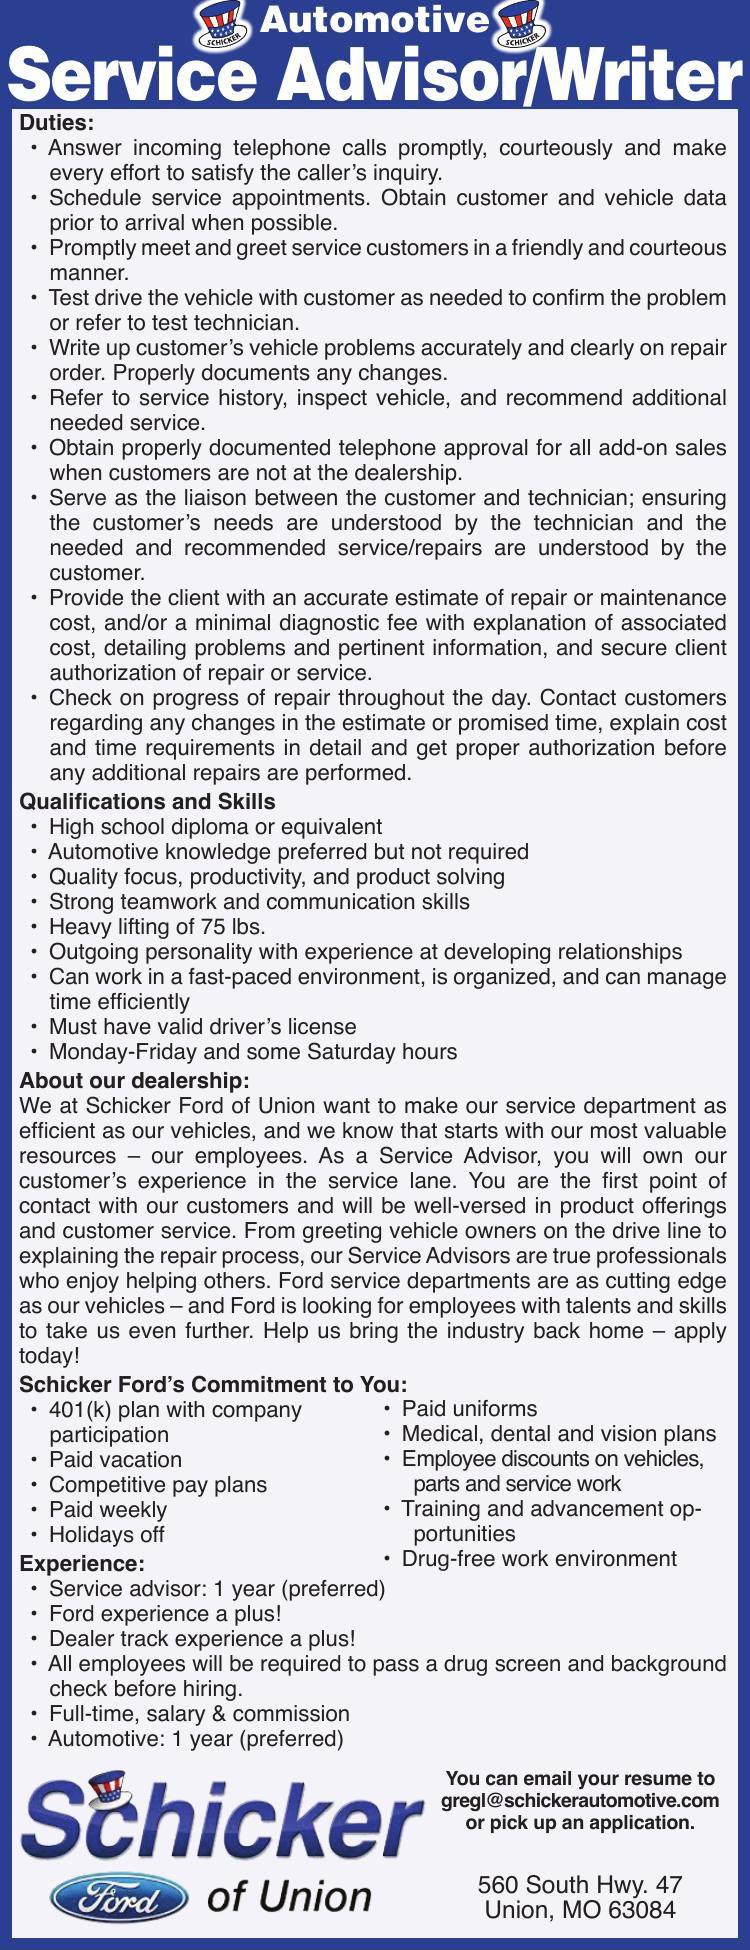 Automotive Service Advisor/Writer